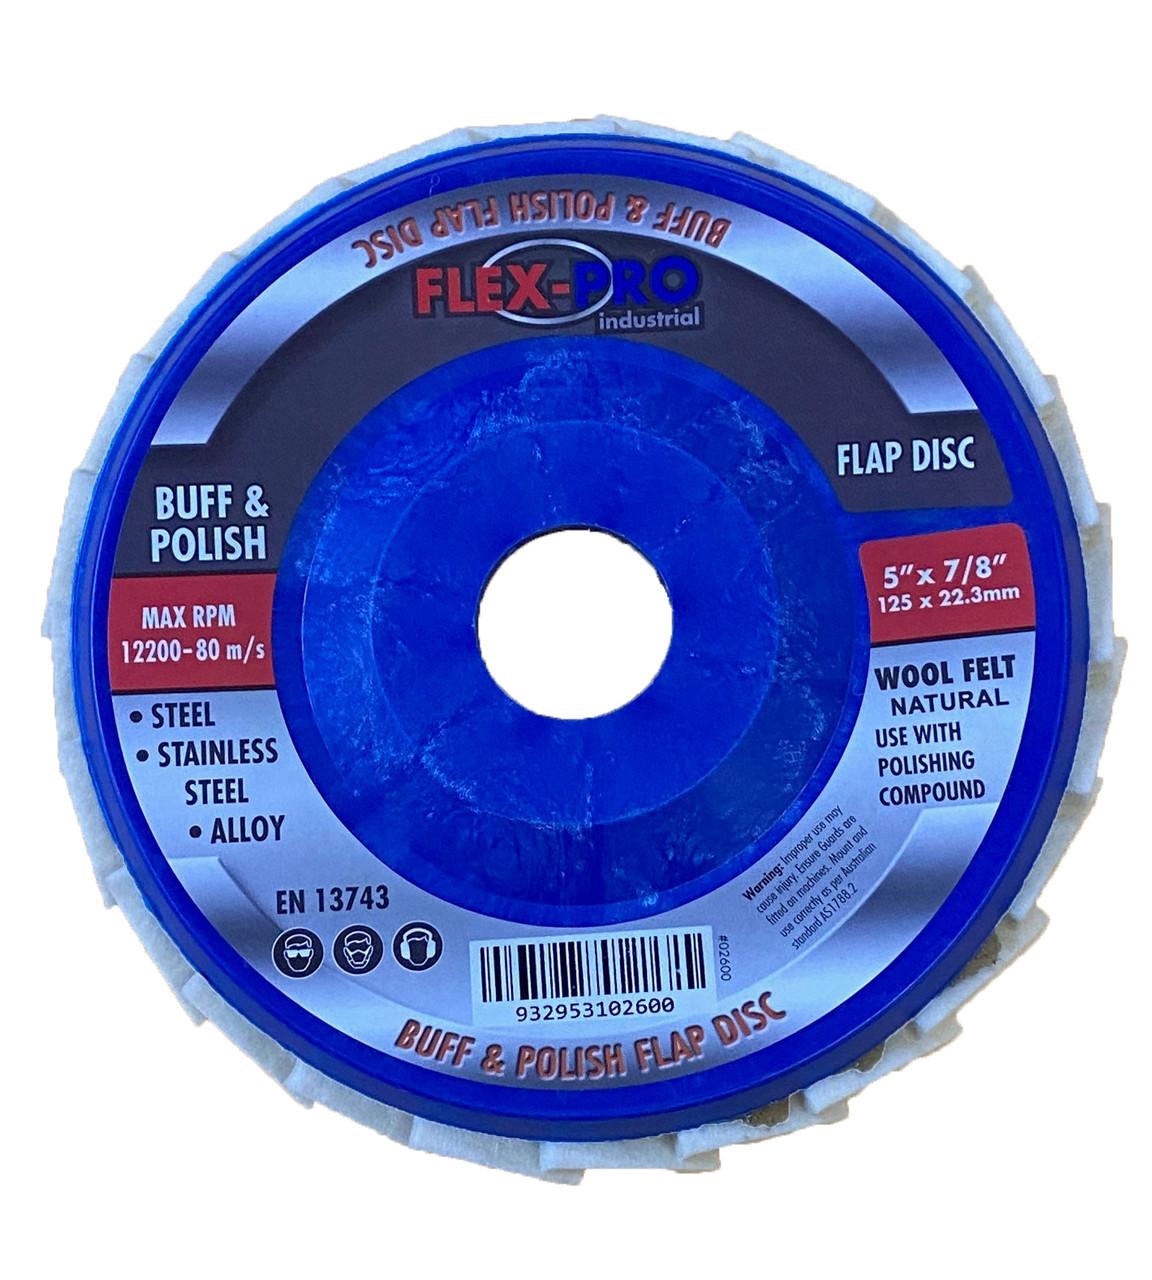 "Buffing and polishing Flap disc 5"" 125mm FLEXPRO"